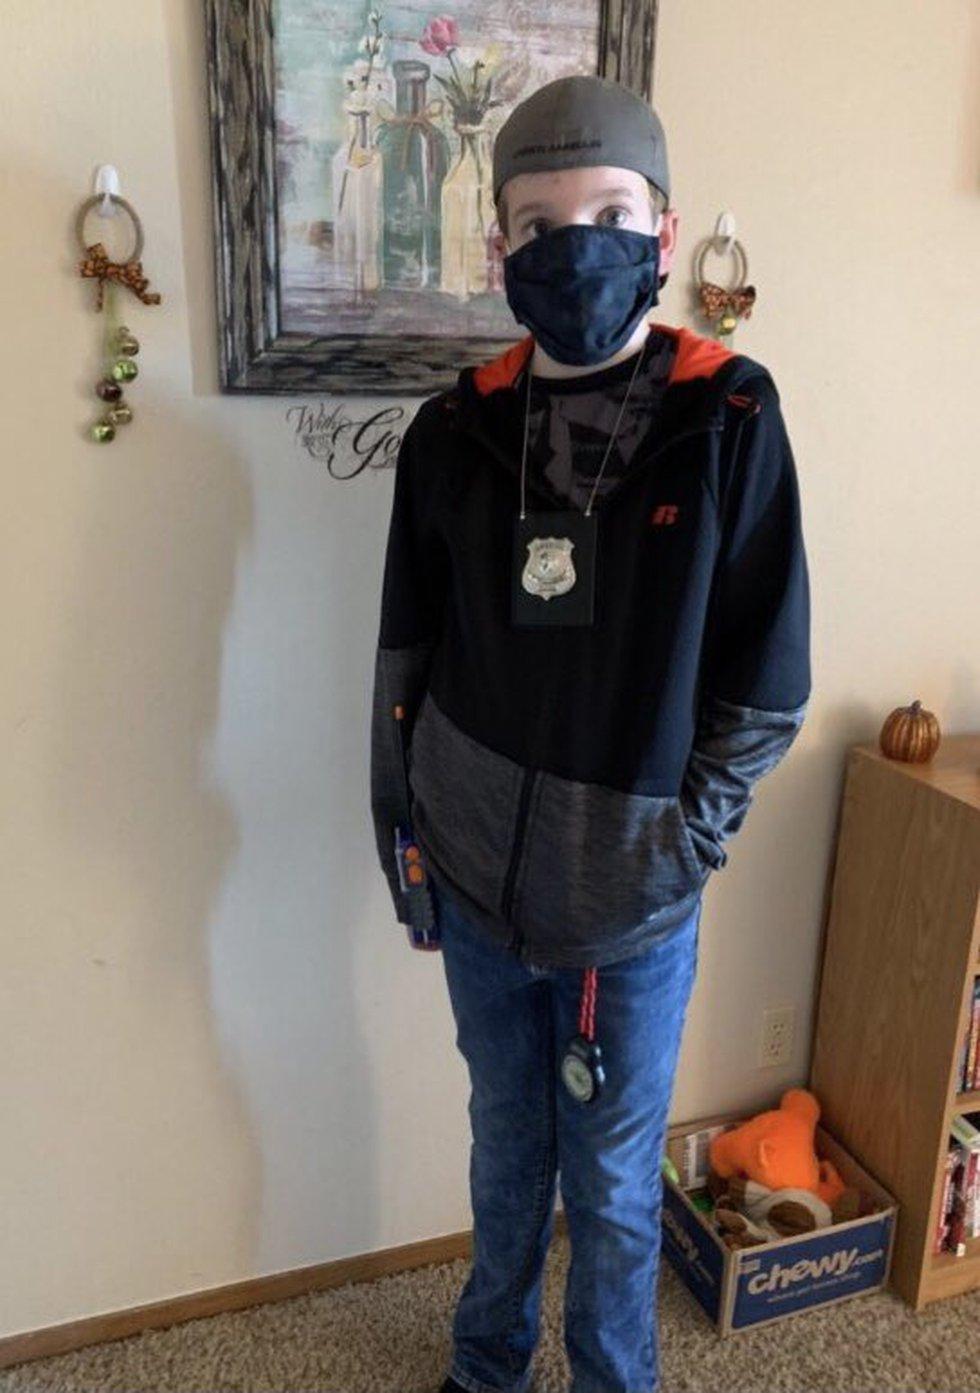 Ryan Larsen, 11, has been missing since he walked away from his school in La Vista on Monday,...